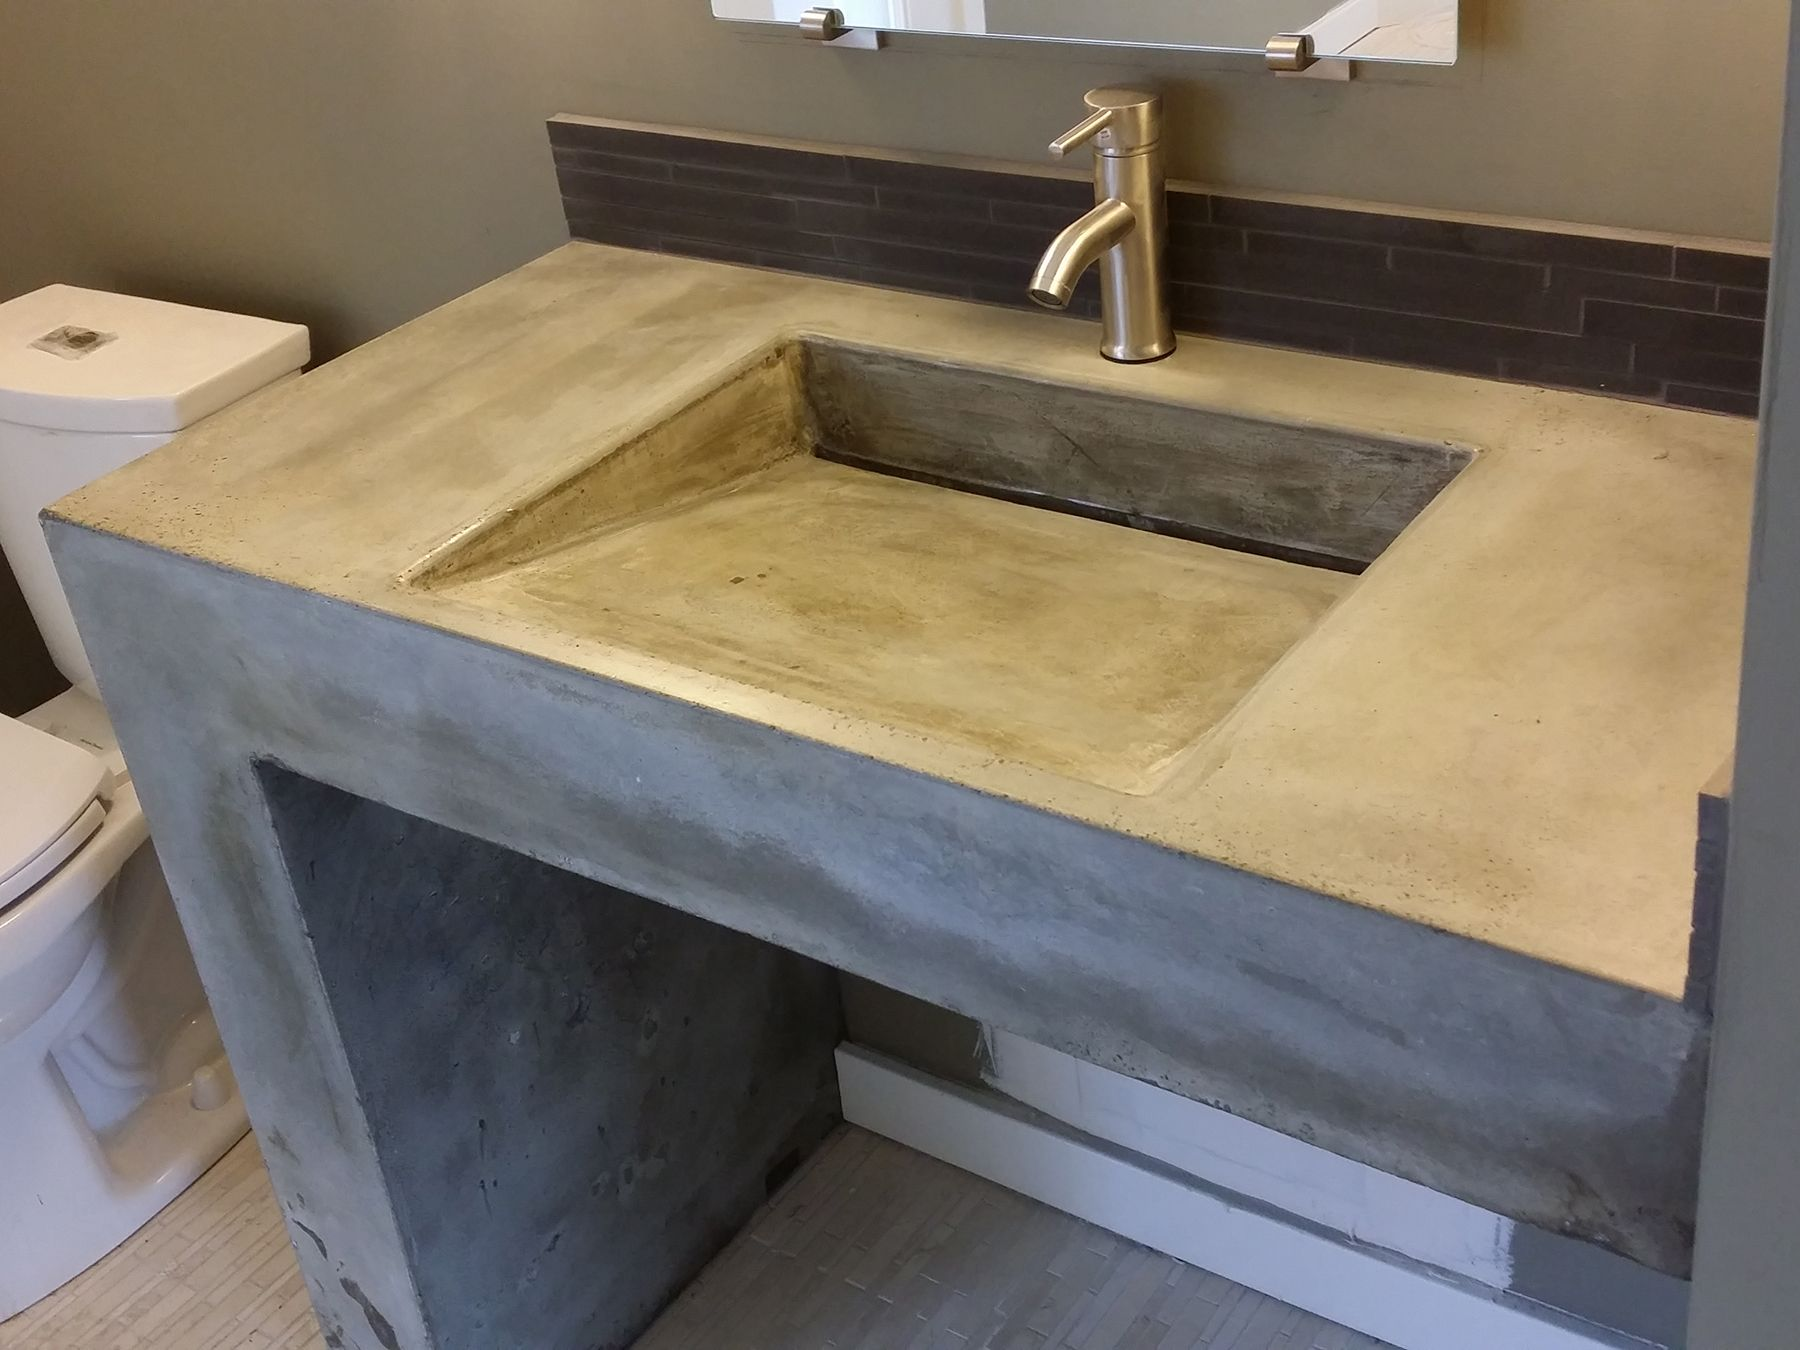 concrete ramp sink with waterfall leg